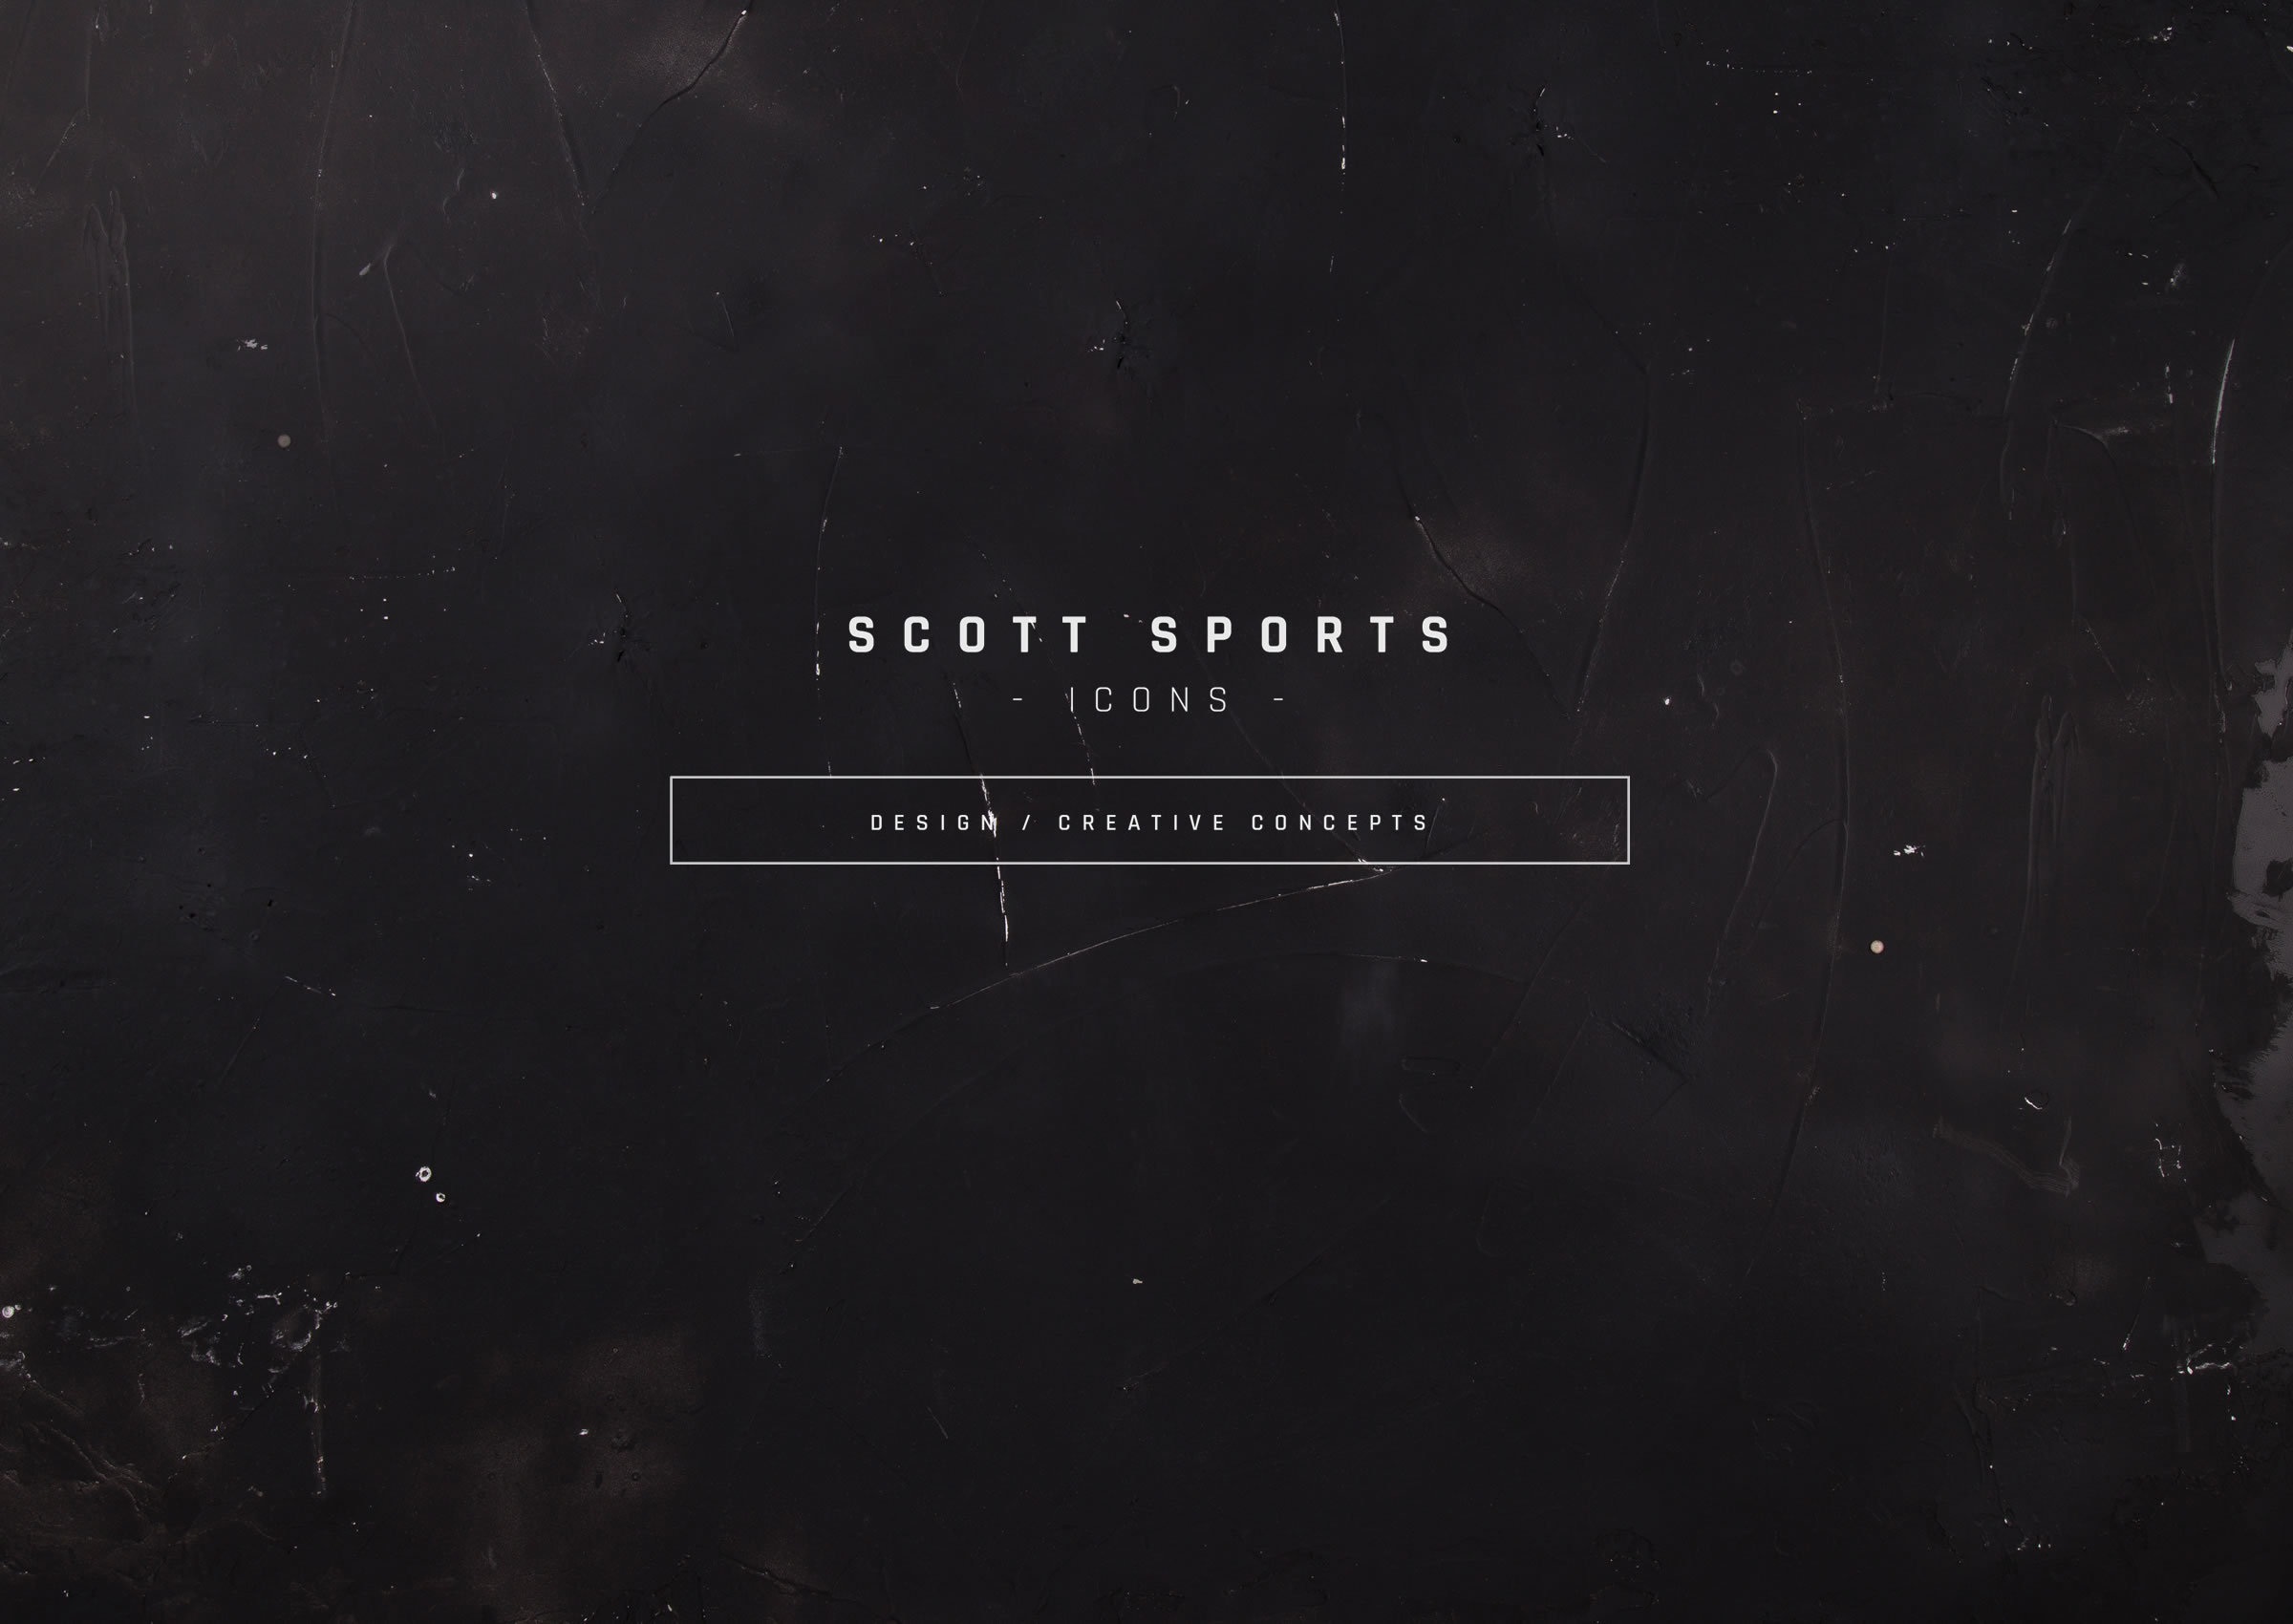 Scott Sports Icon / Logo Designed by Rob Swain